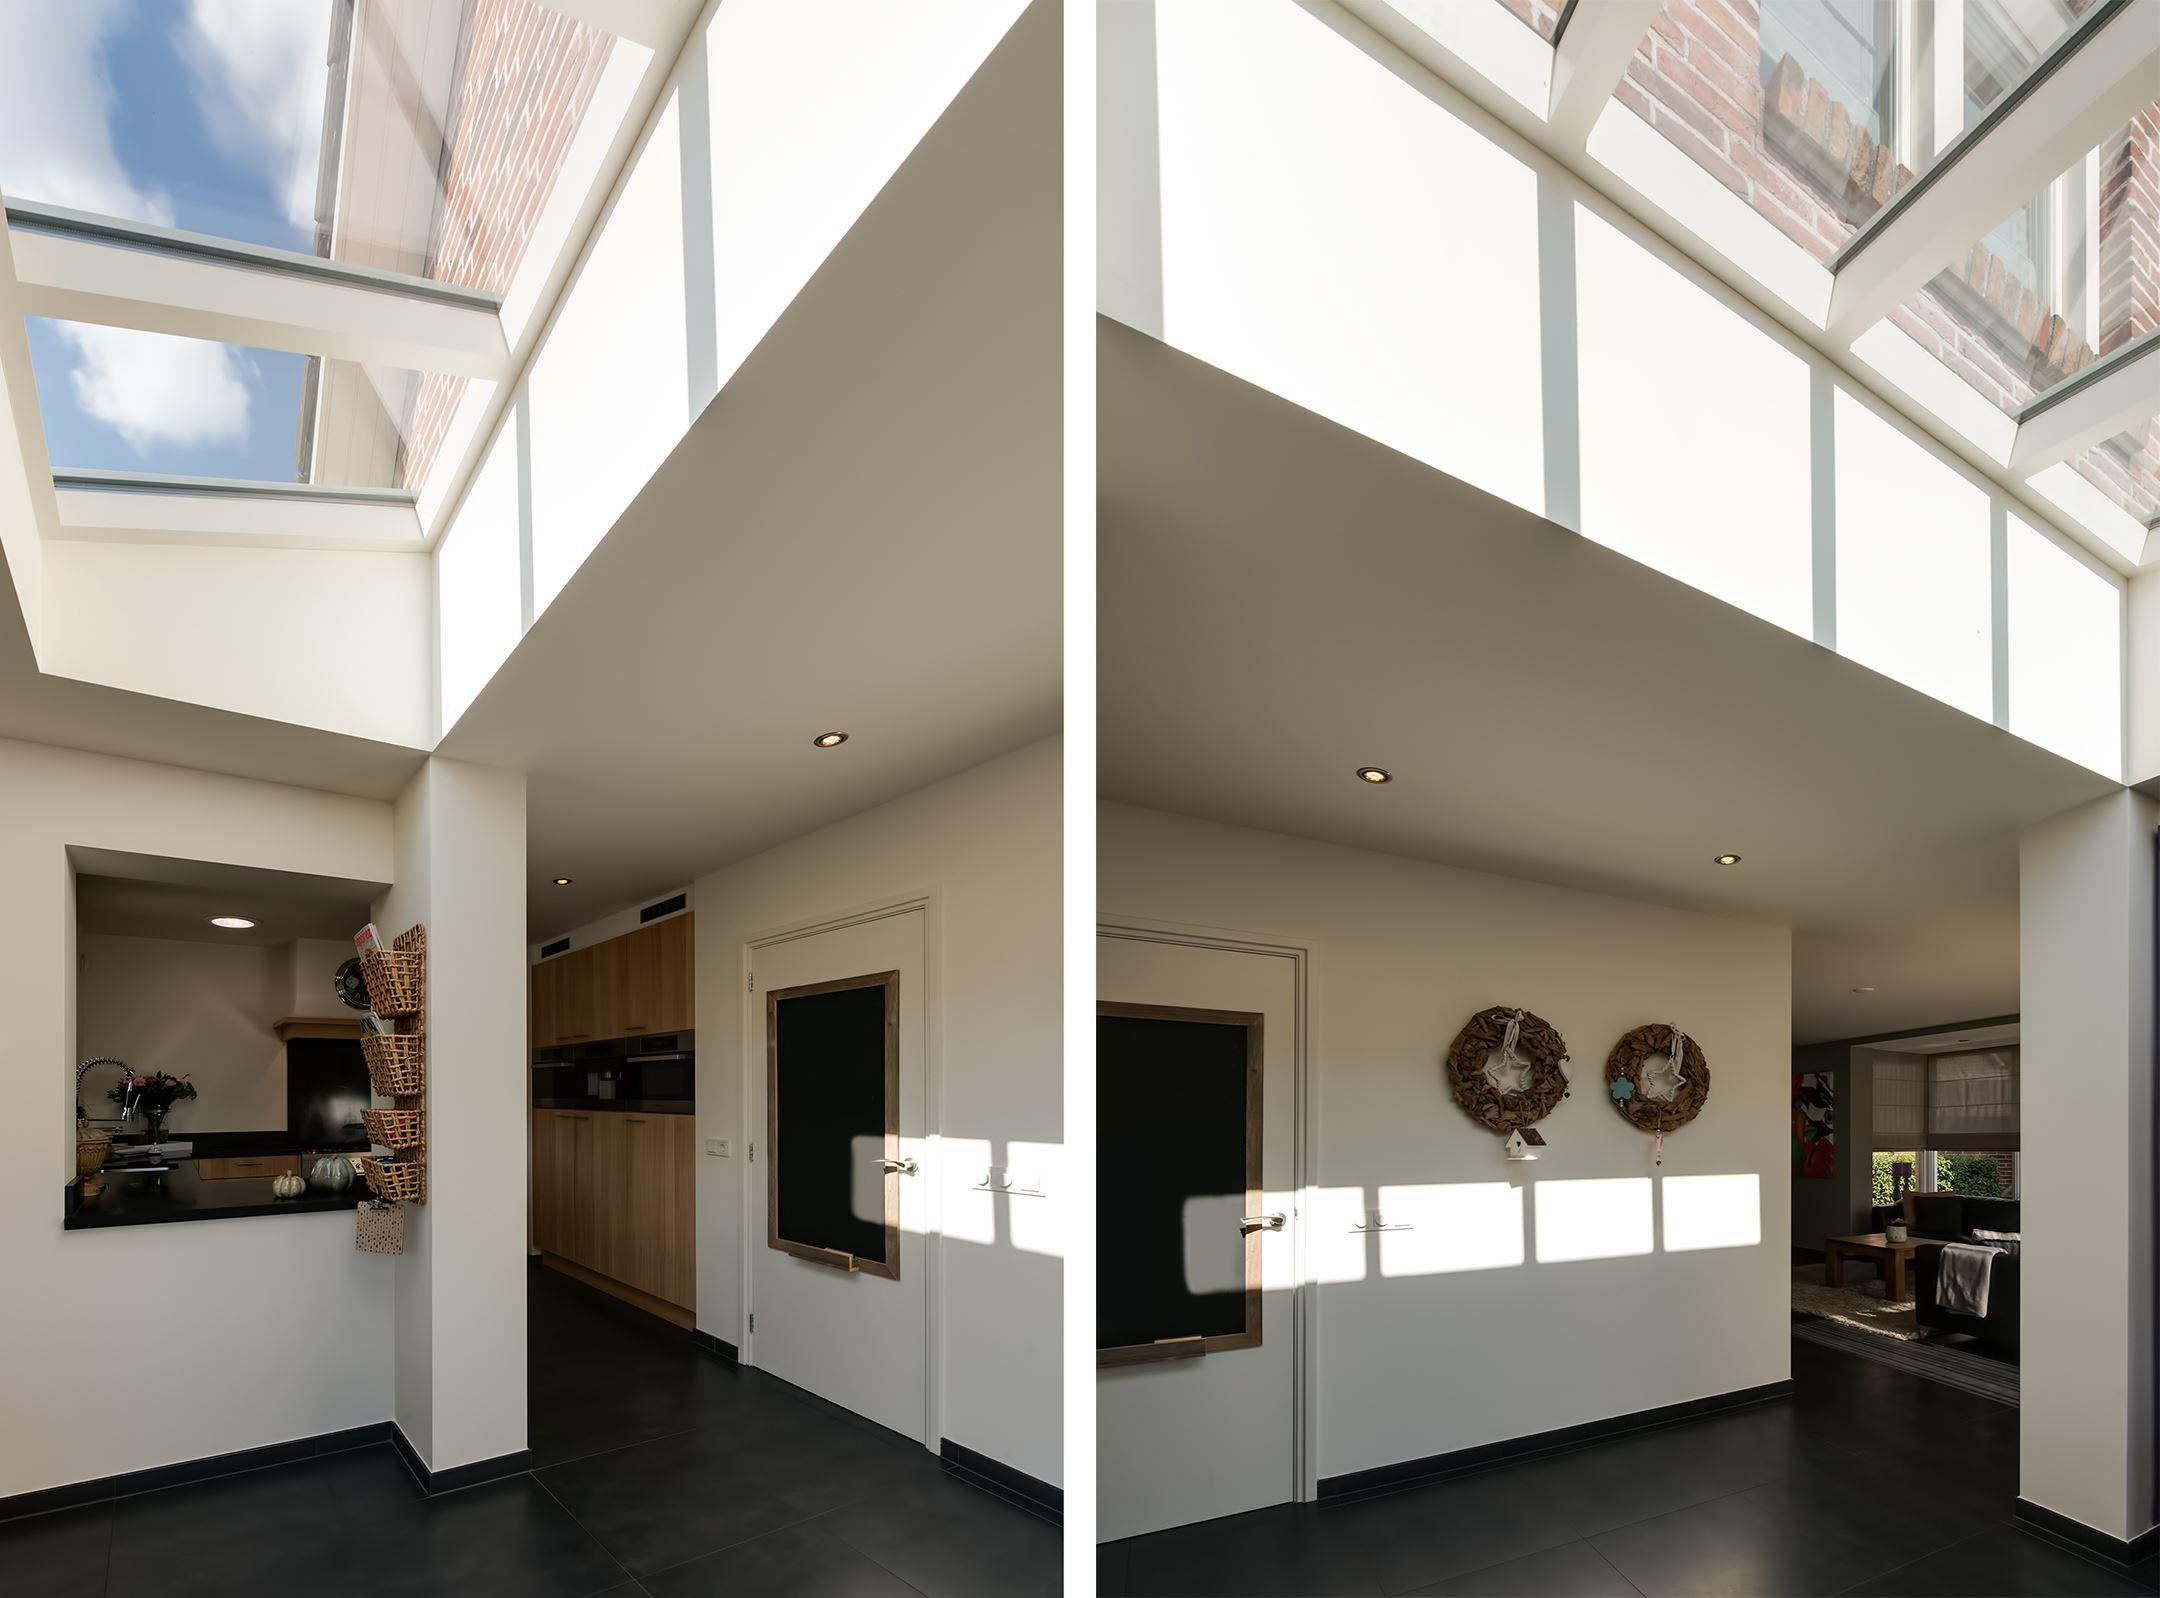 Best Restaurant De Eetkamer Wernhout Photos - Huis & Interieur ...